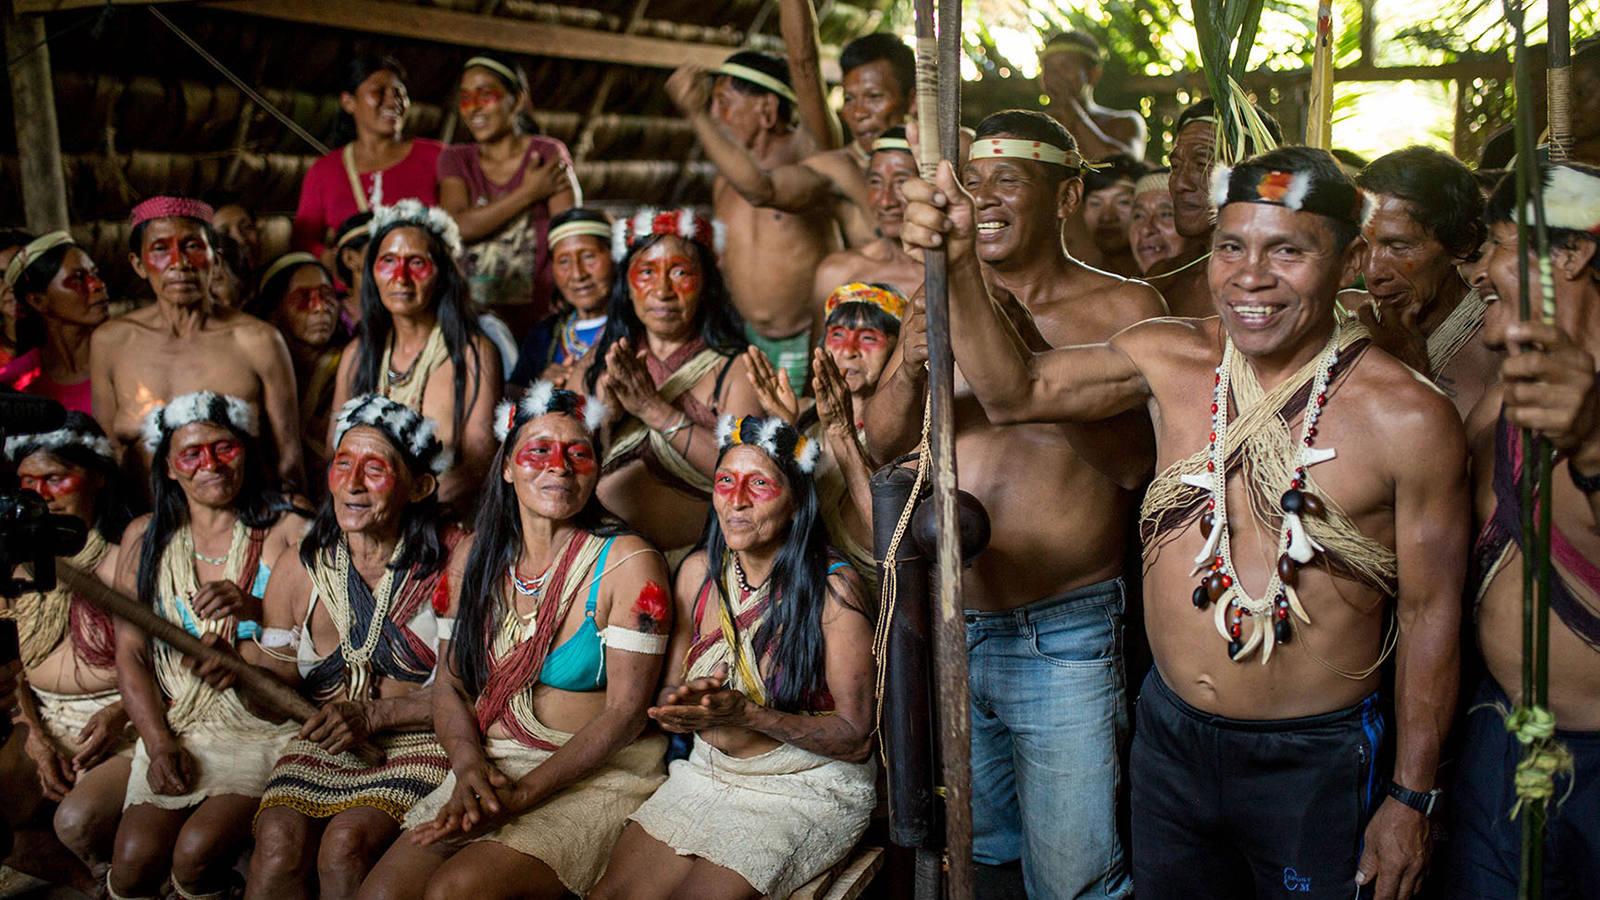 8 Reasons The Landmark Ruling In Ecuador Signals Hope In The